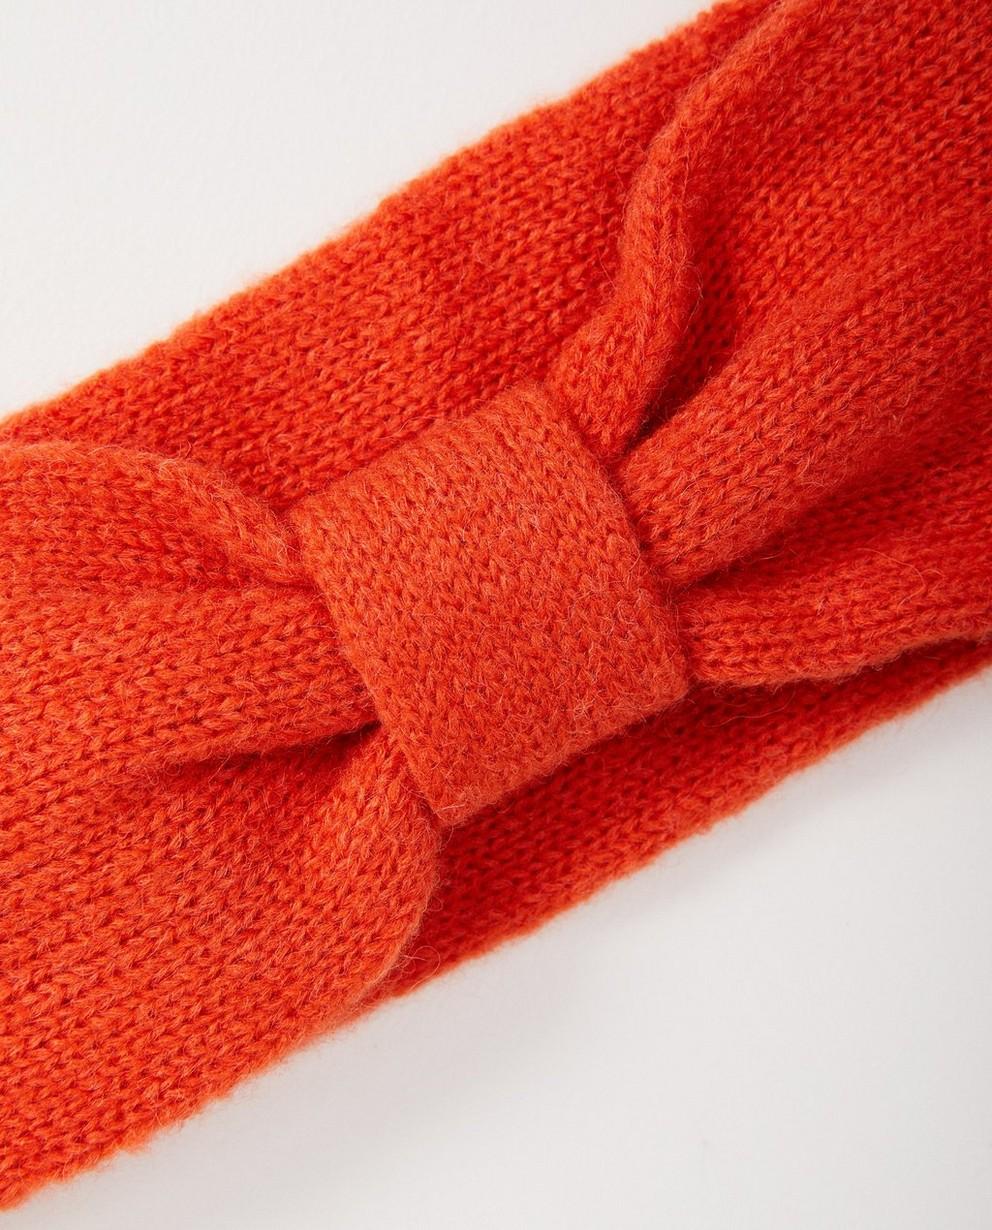 Bonneterie - rood fel - Bandeau orange #Like Me